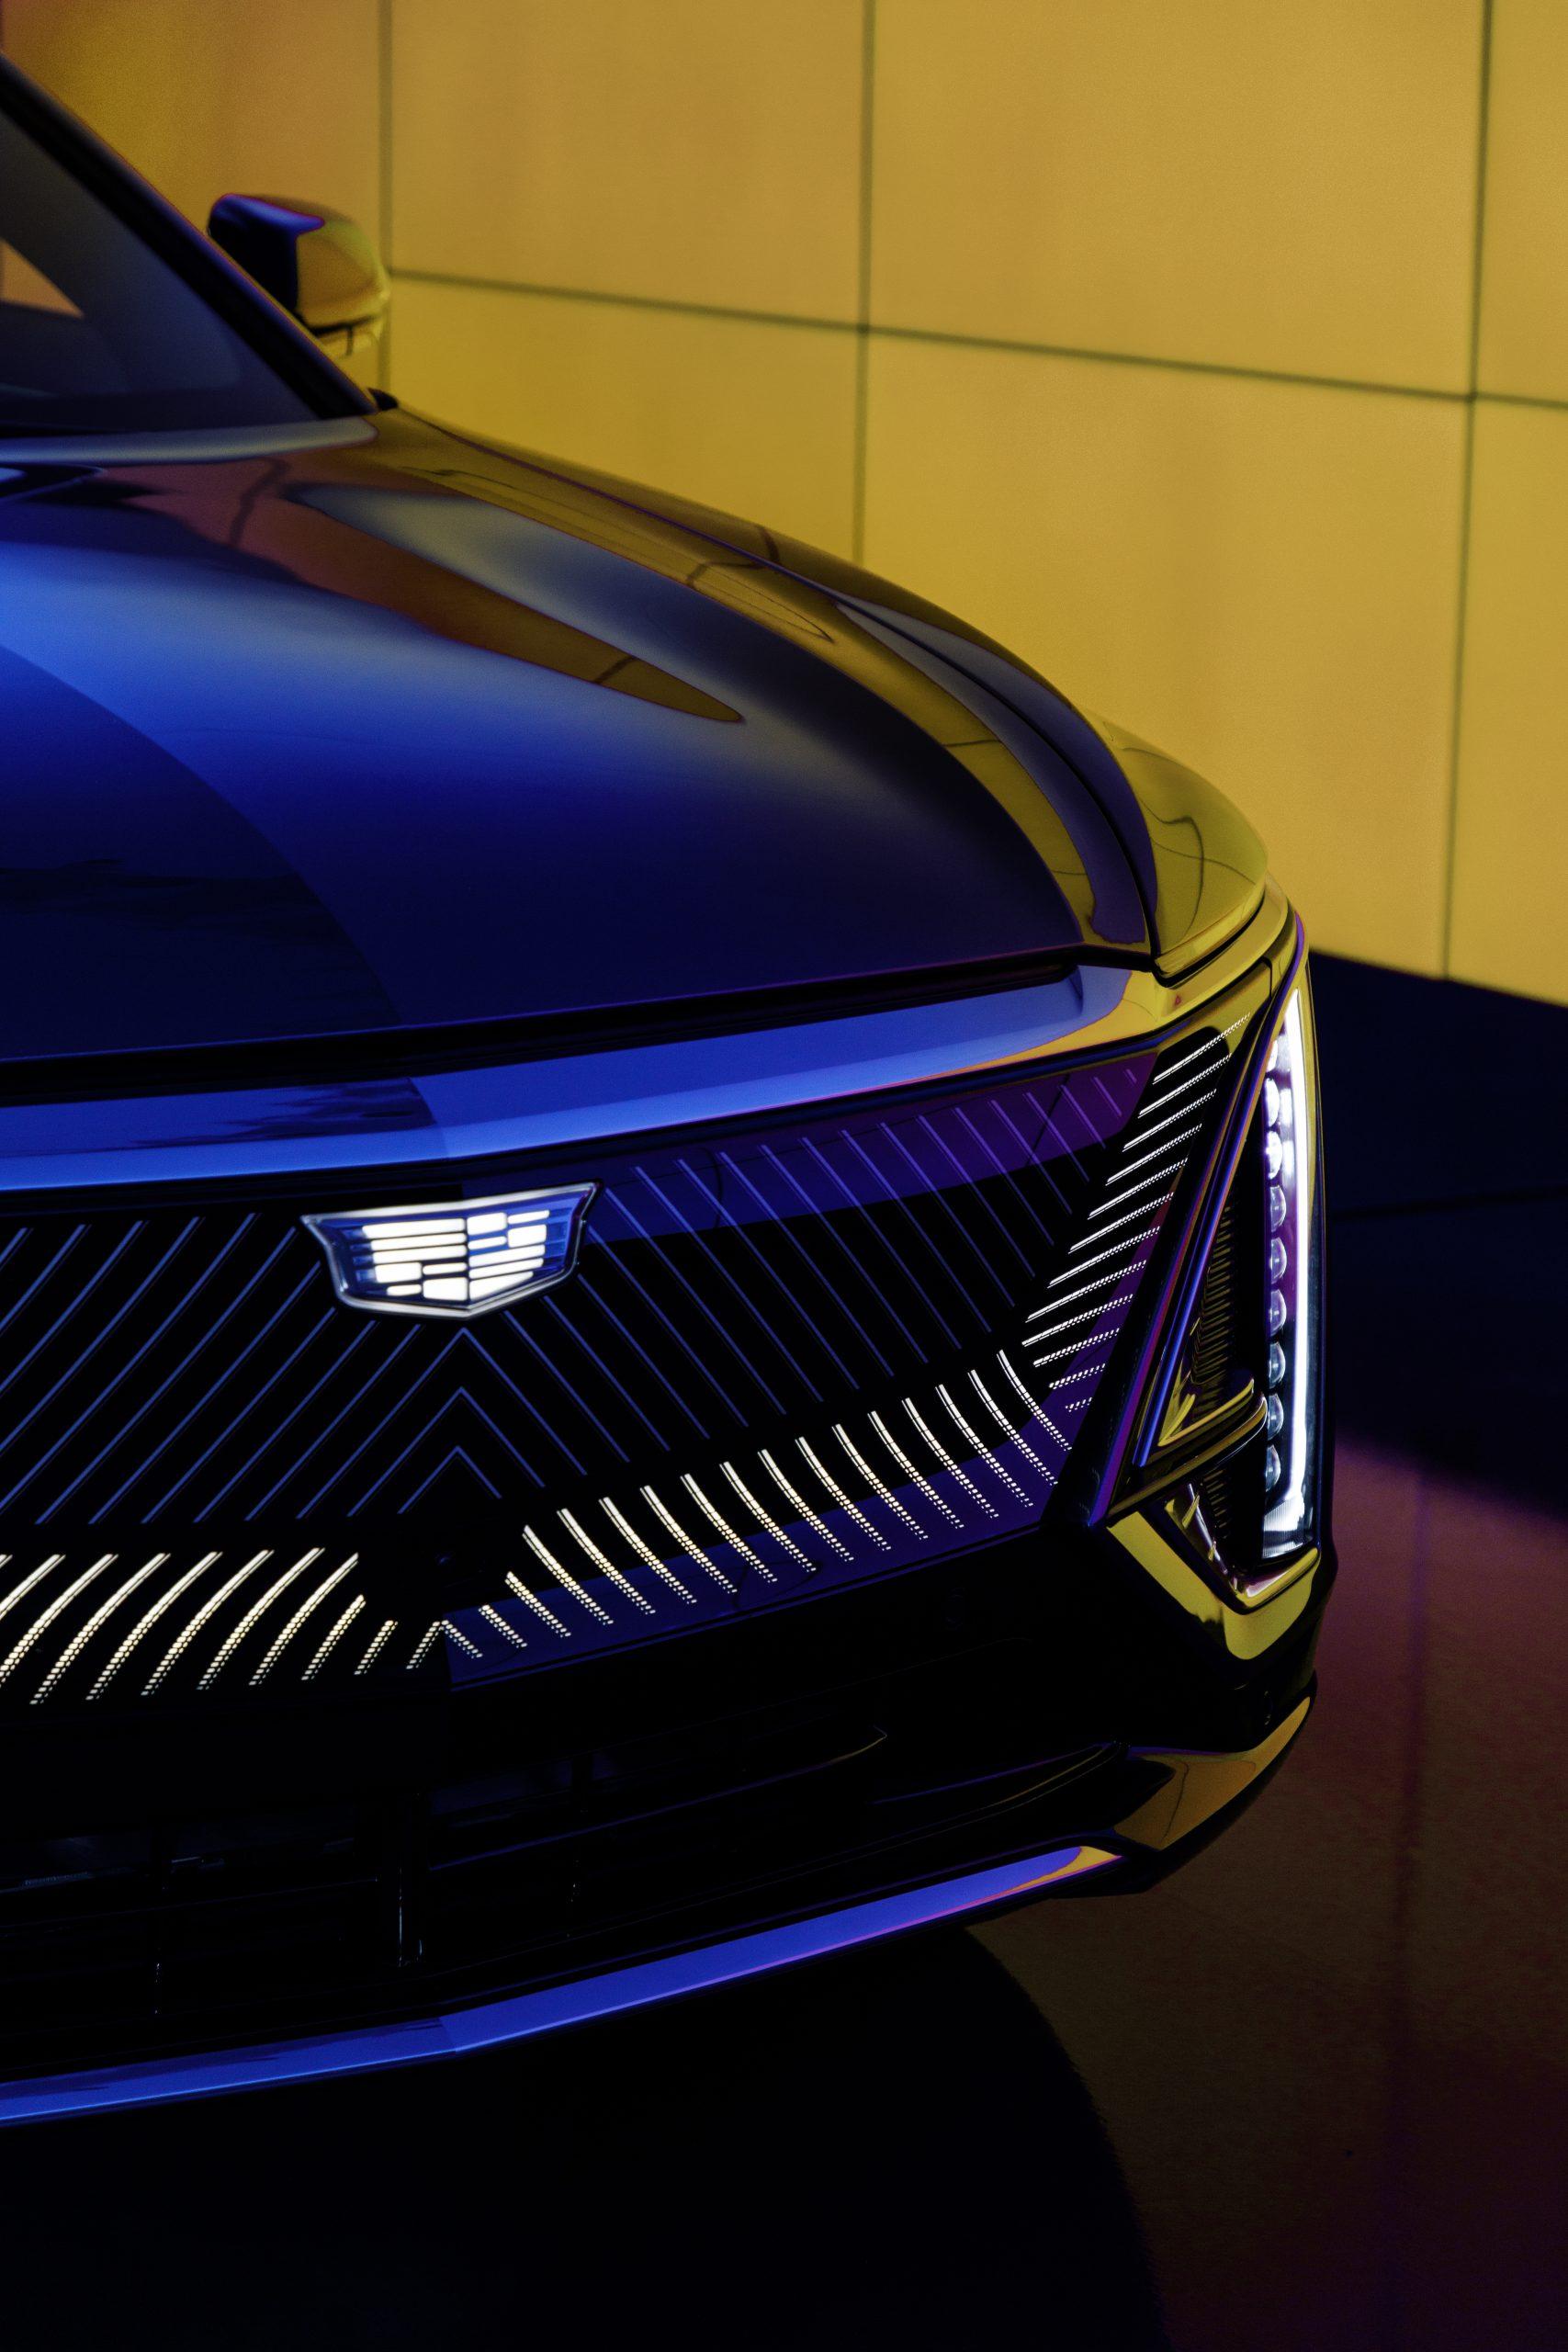 2023 Cadillac Lyriq front headlight